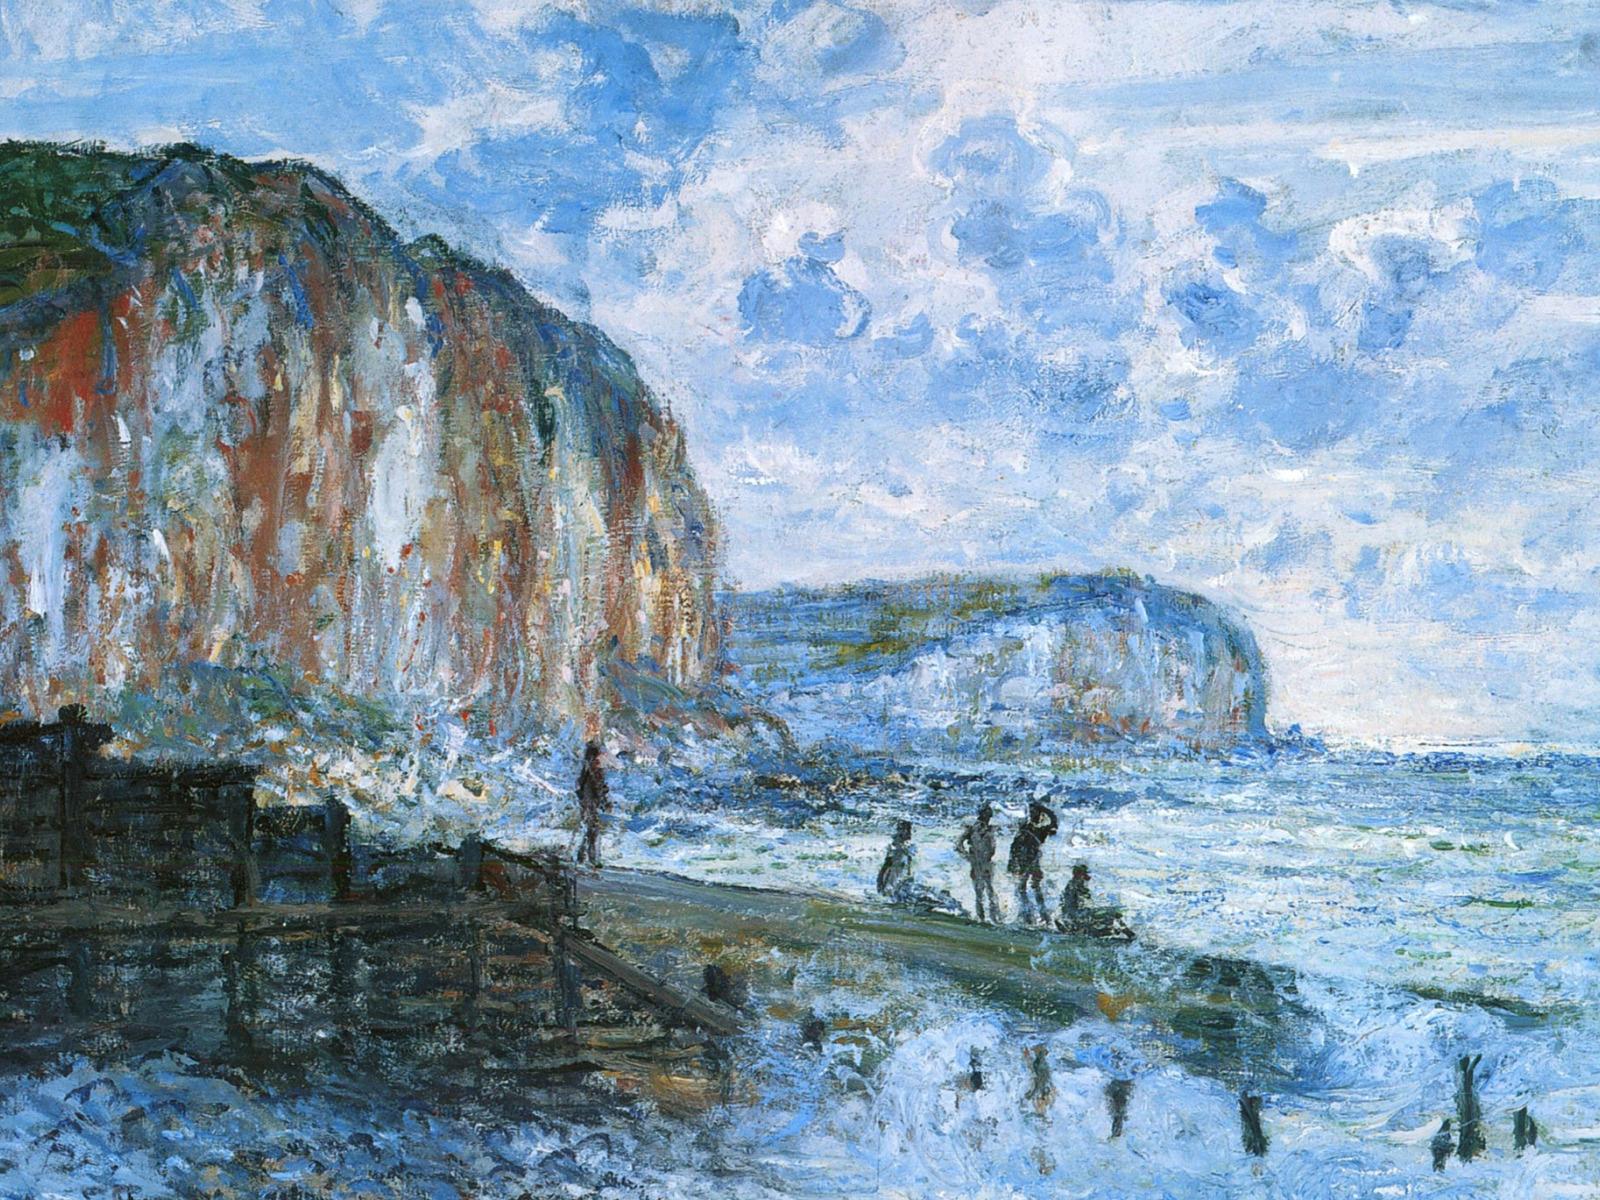 скалы и море < Скалы Пти-Далле >:: Клод Моне, описание картины - Claude Monet фото